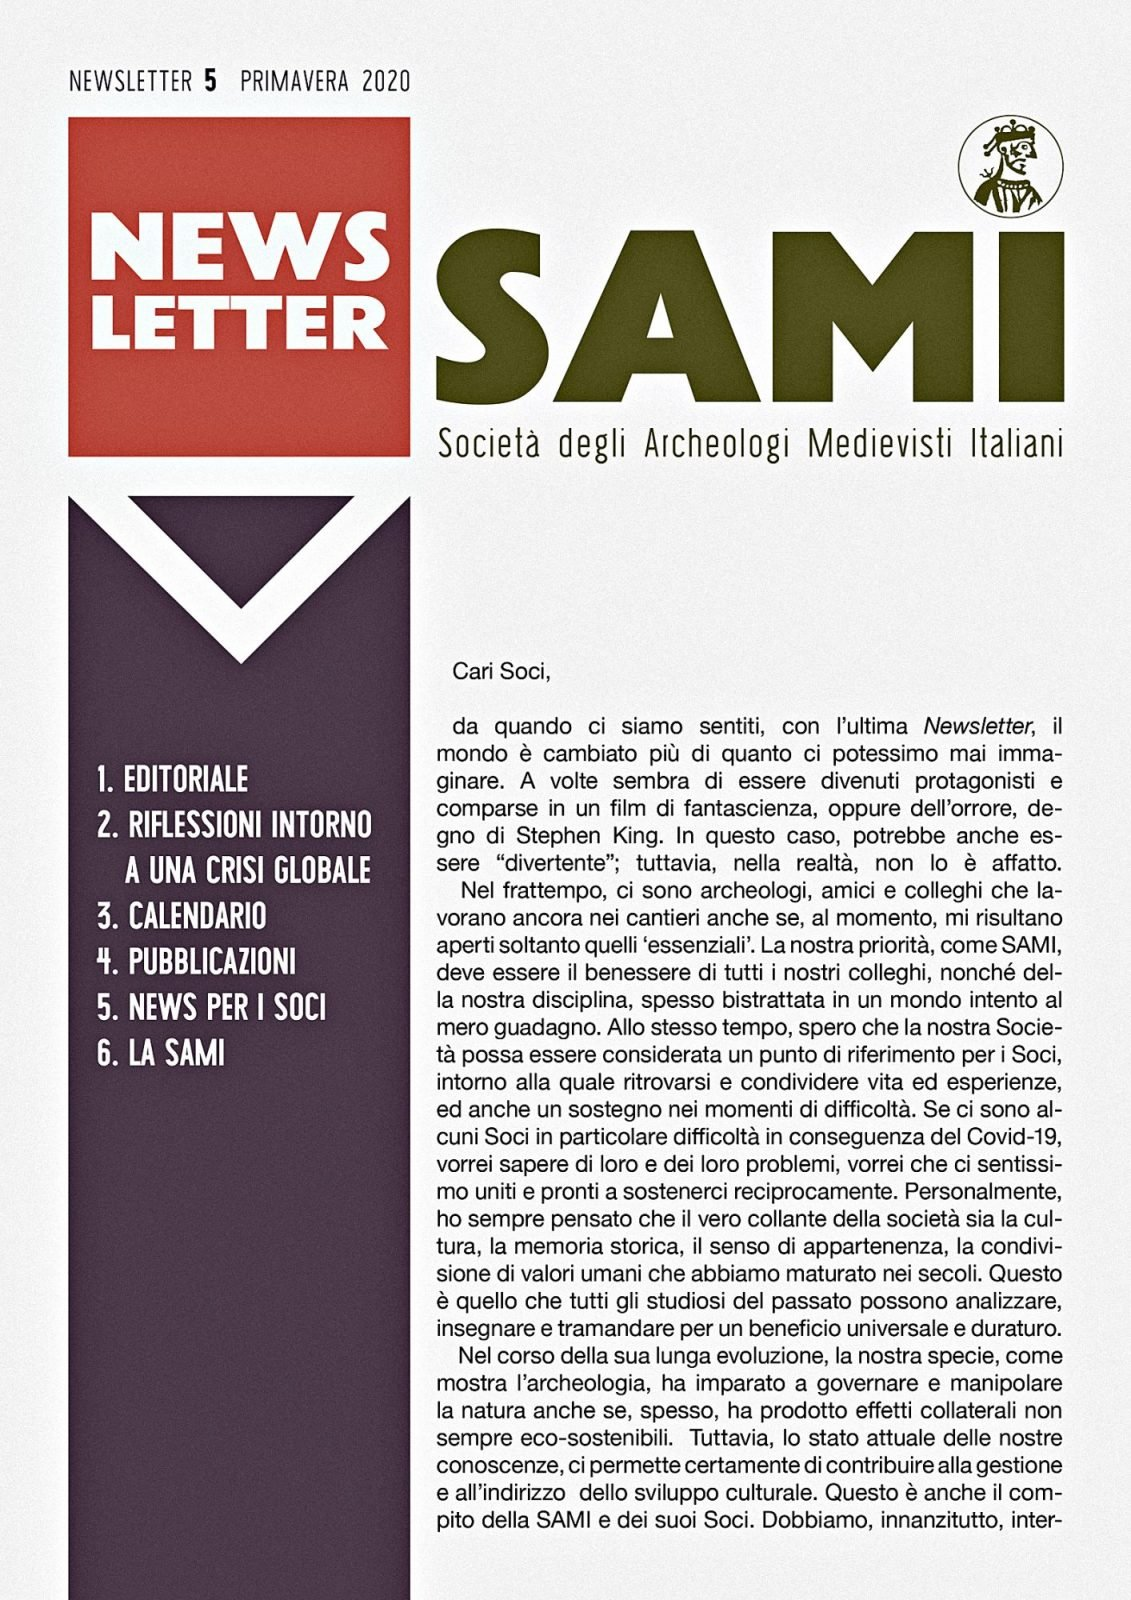 SAMI, Newsletter, primavera 2020.